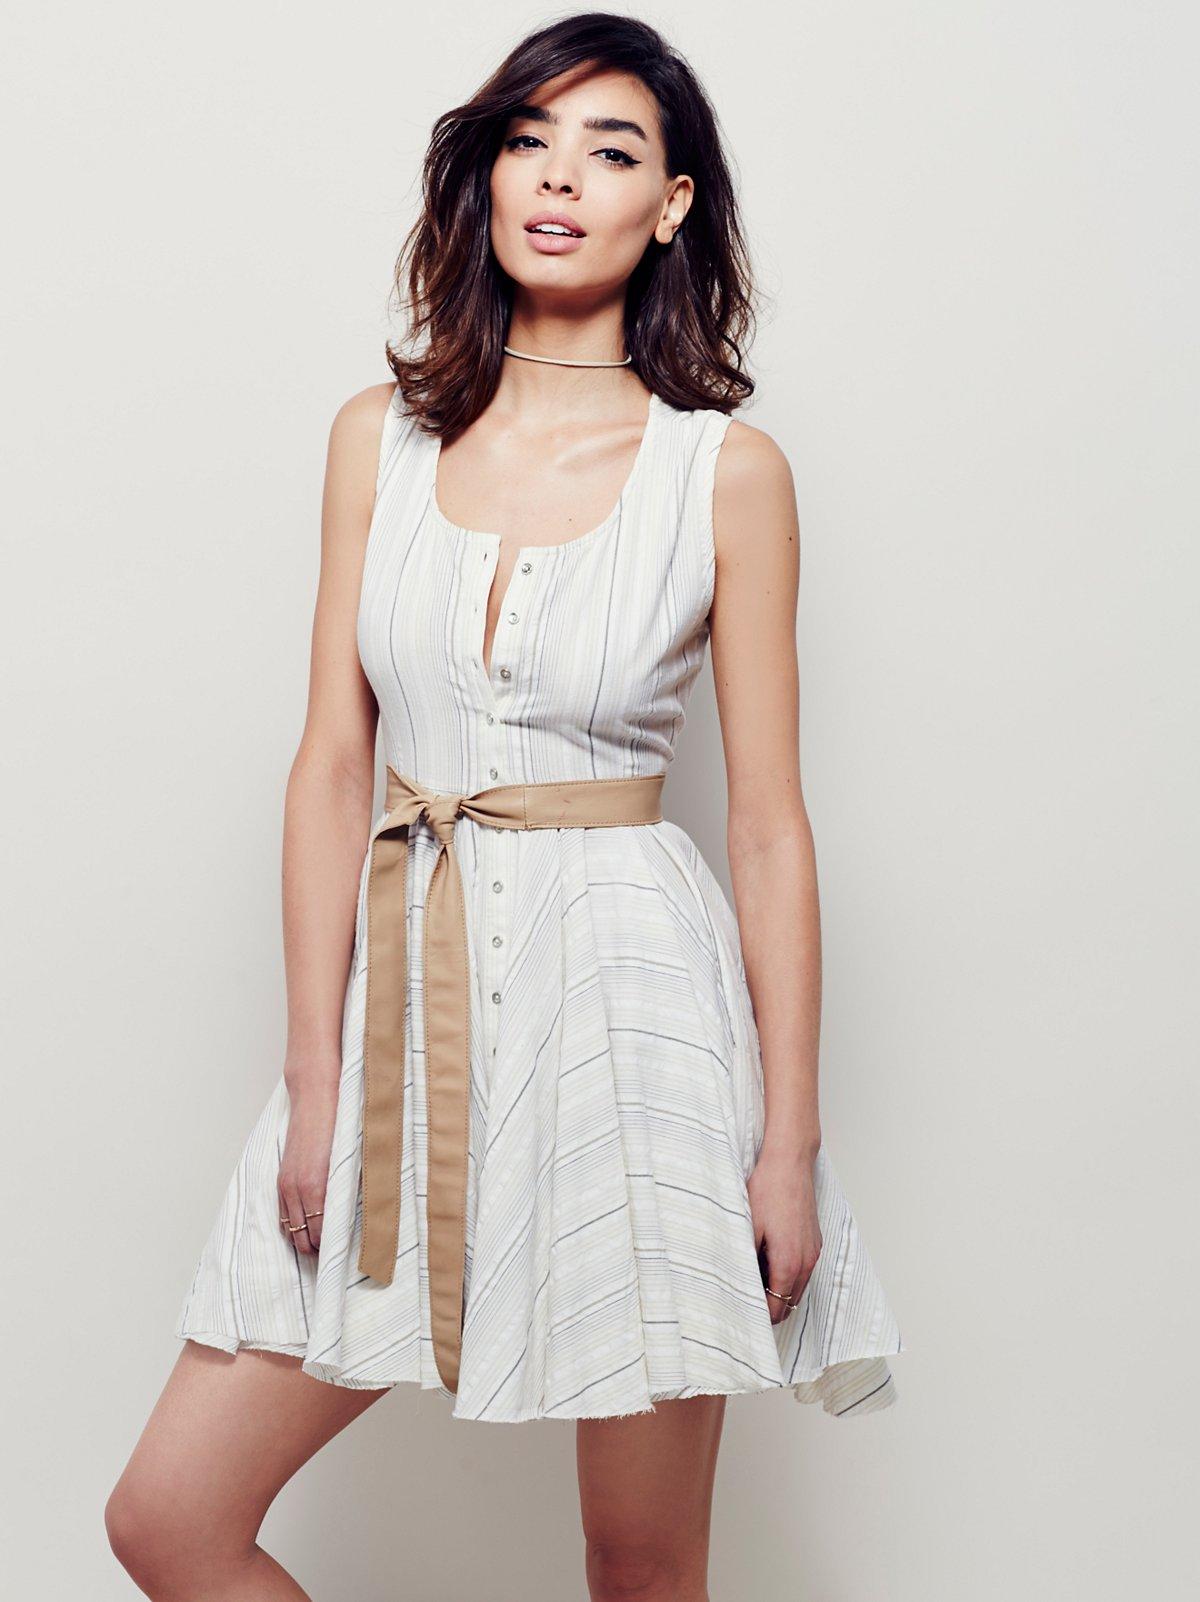 Picnic Party Dress